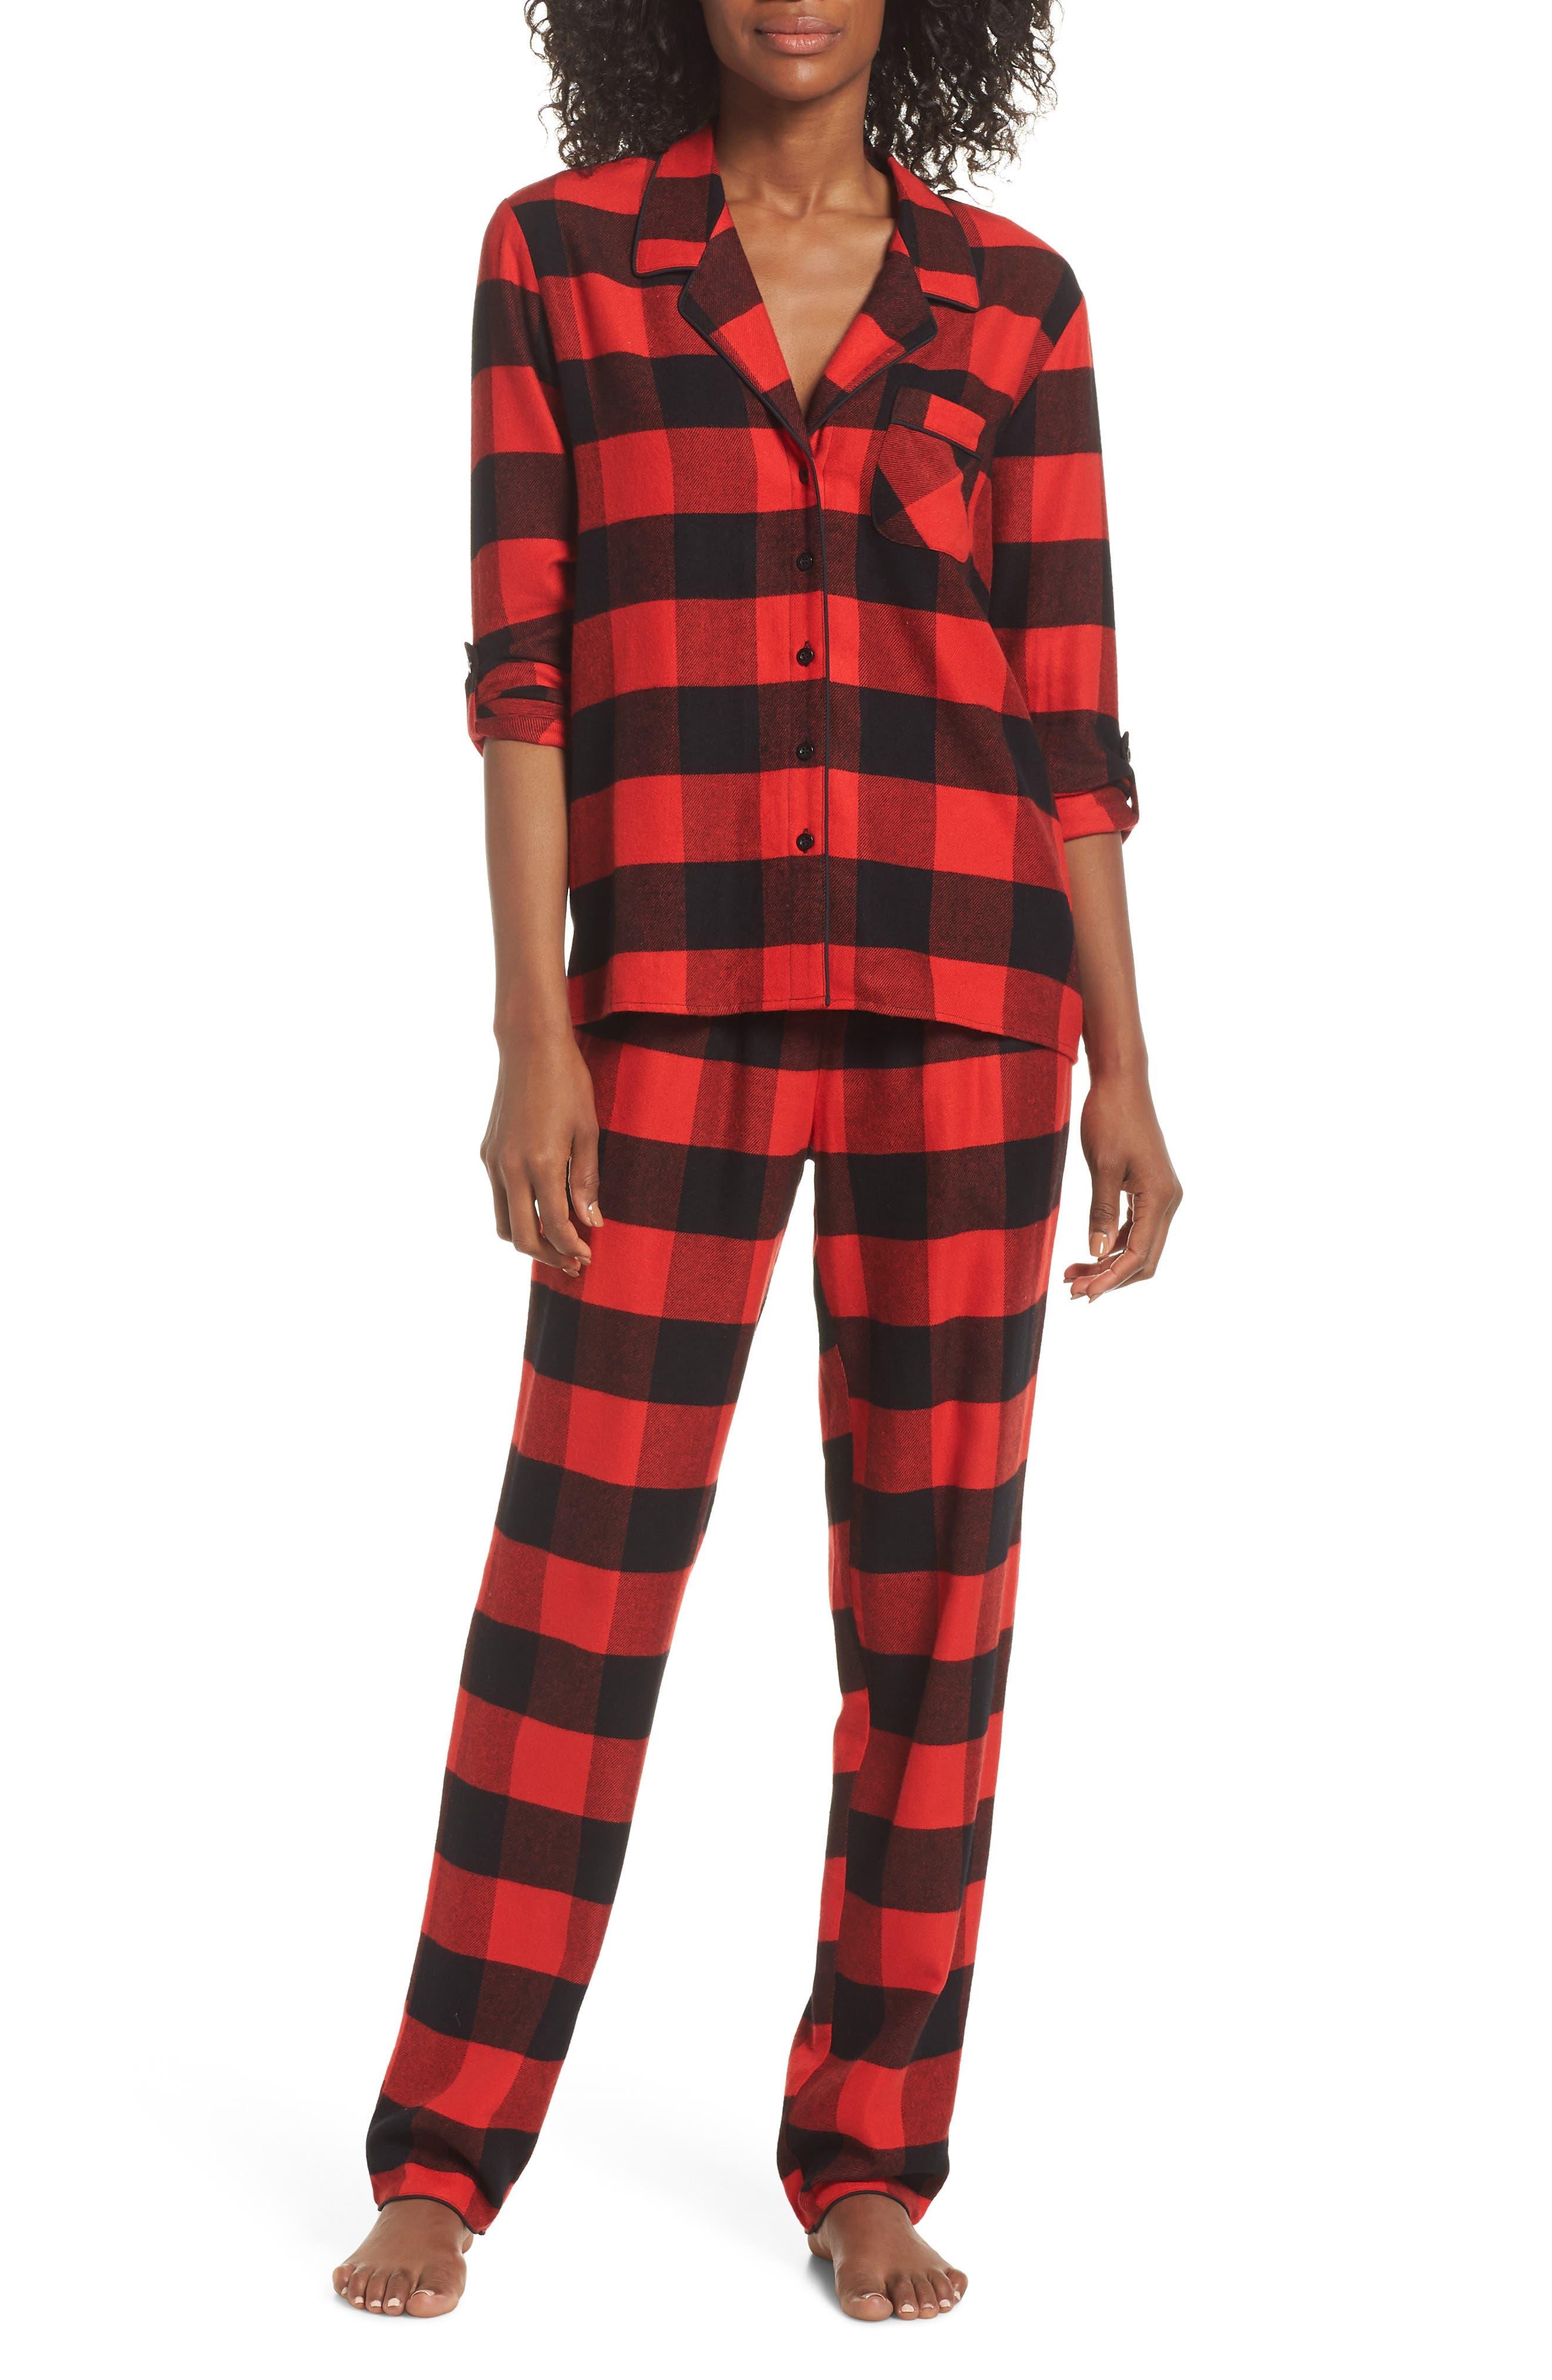 Nordstrom Lingerie Starlight Flannel Pajamas, Red